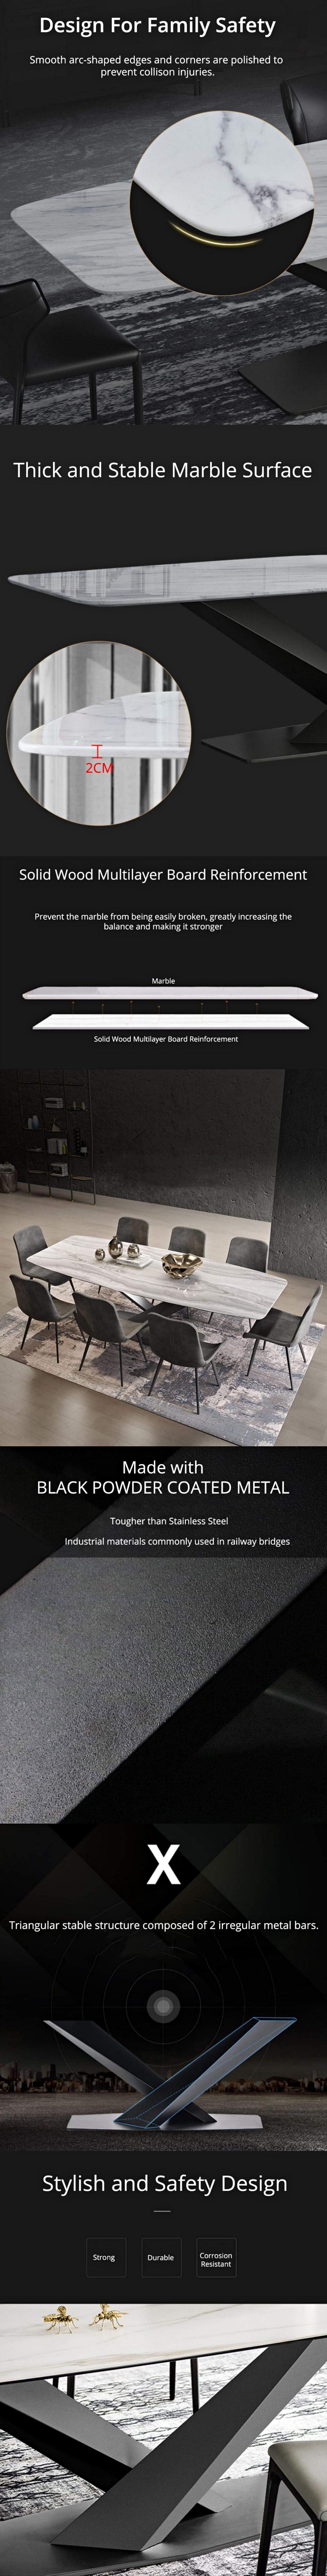 Rectangular-V-Base-Dining-Table-Item-Description-2